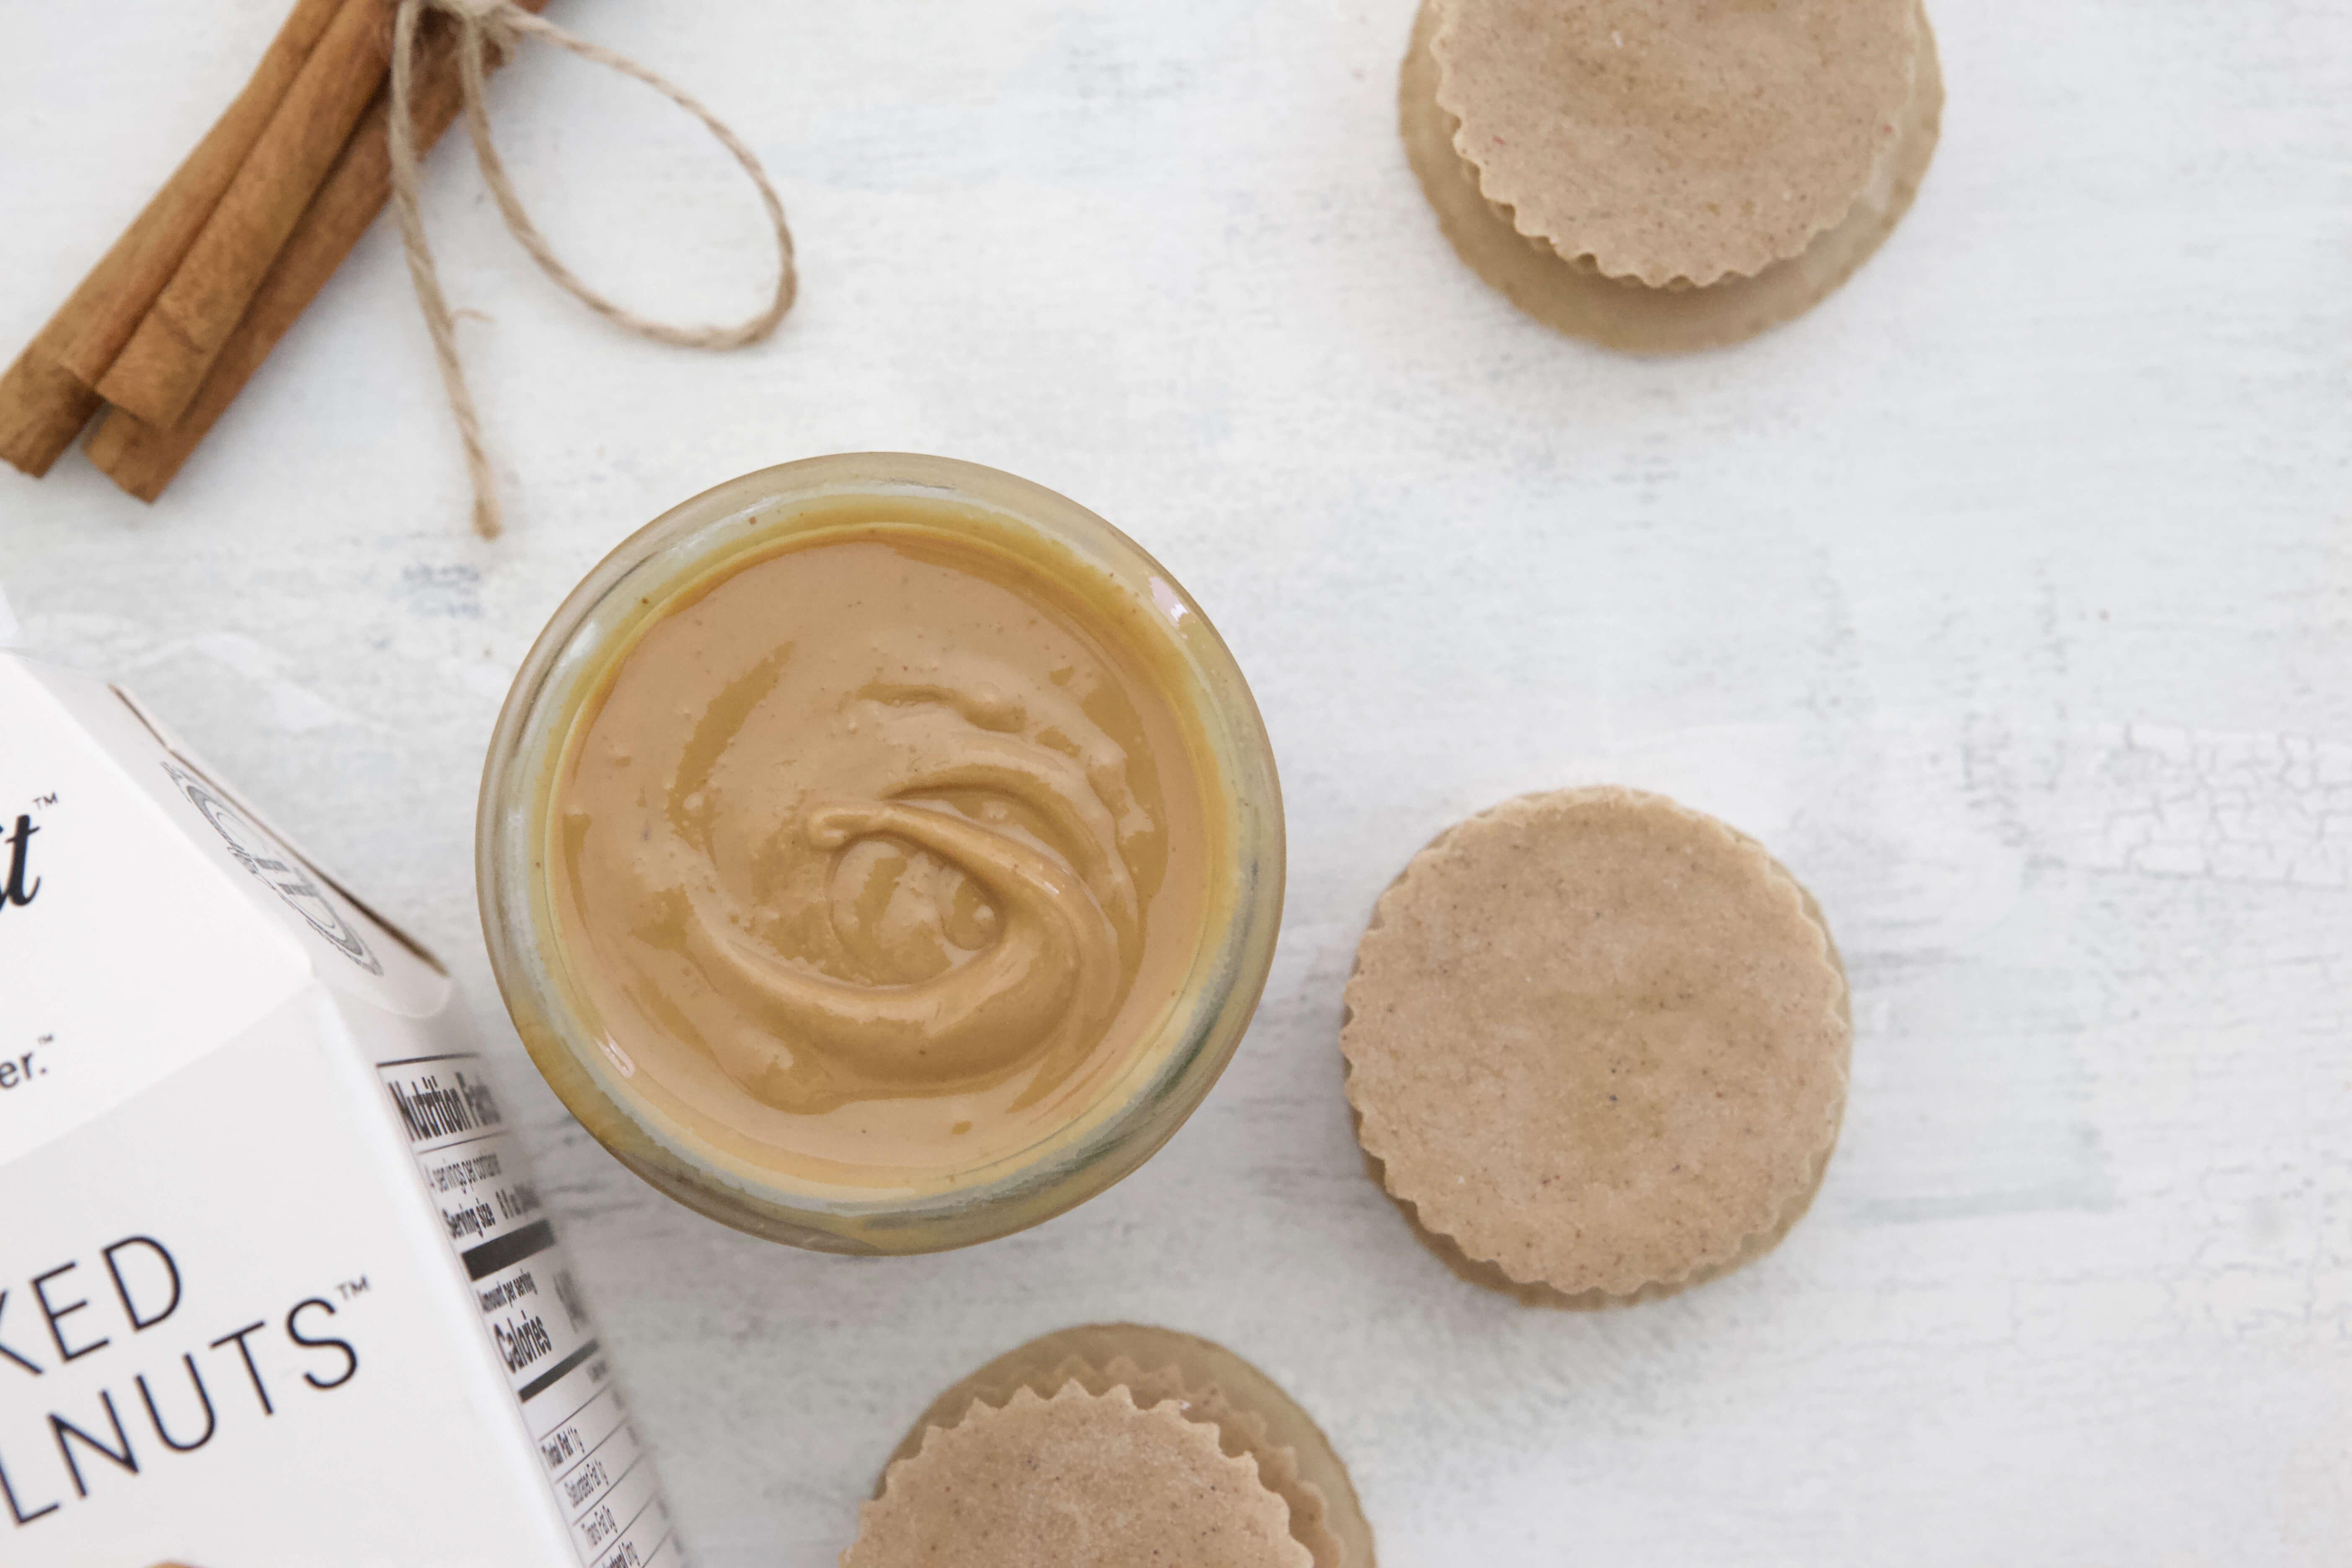 Gluten Free Recipe Roundup Nine www.sarahkayhoffman.com #healthyliving #recipes #glutenfree #dairyfree Apple Spiced Fudge Cups